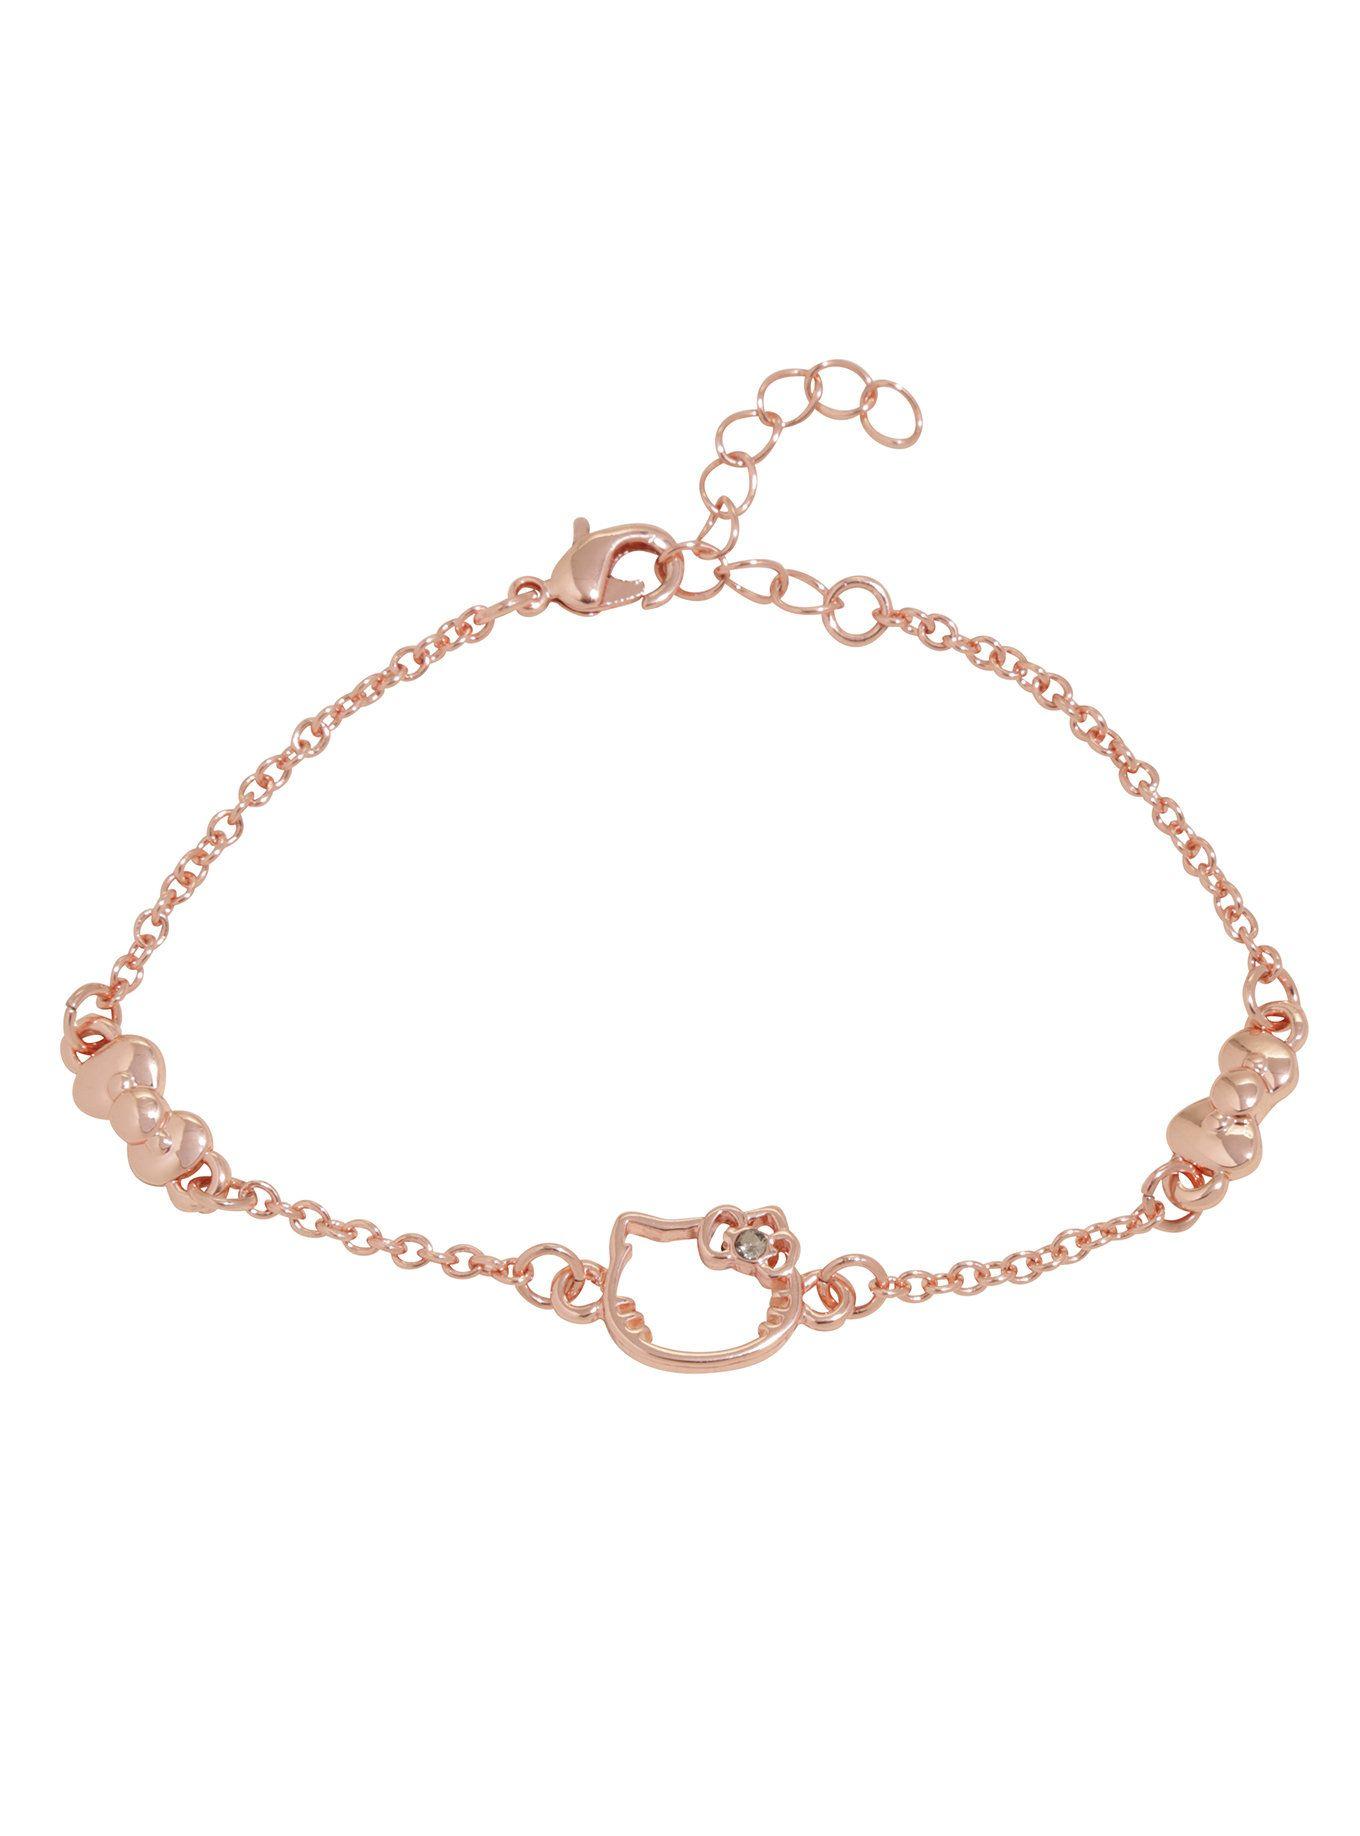 Hello Kitty Rose Gold Dainty Silhouette Bow Bracelet